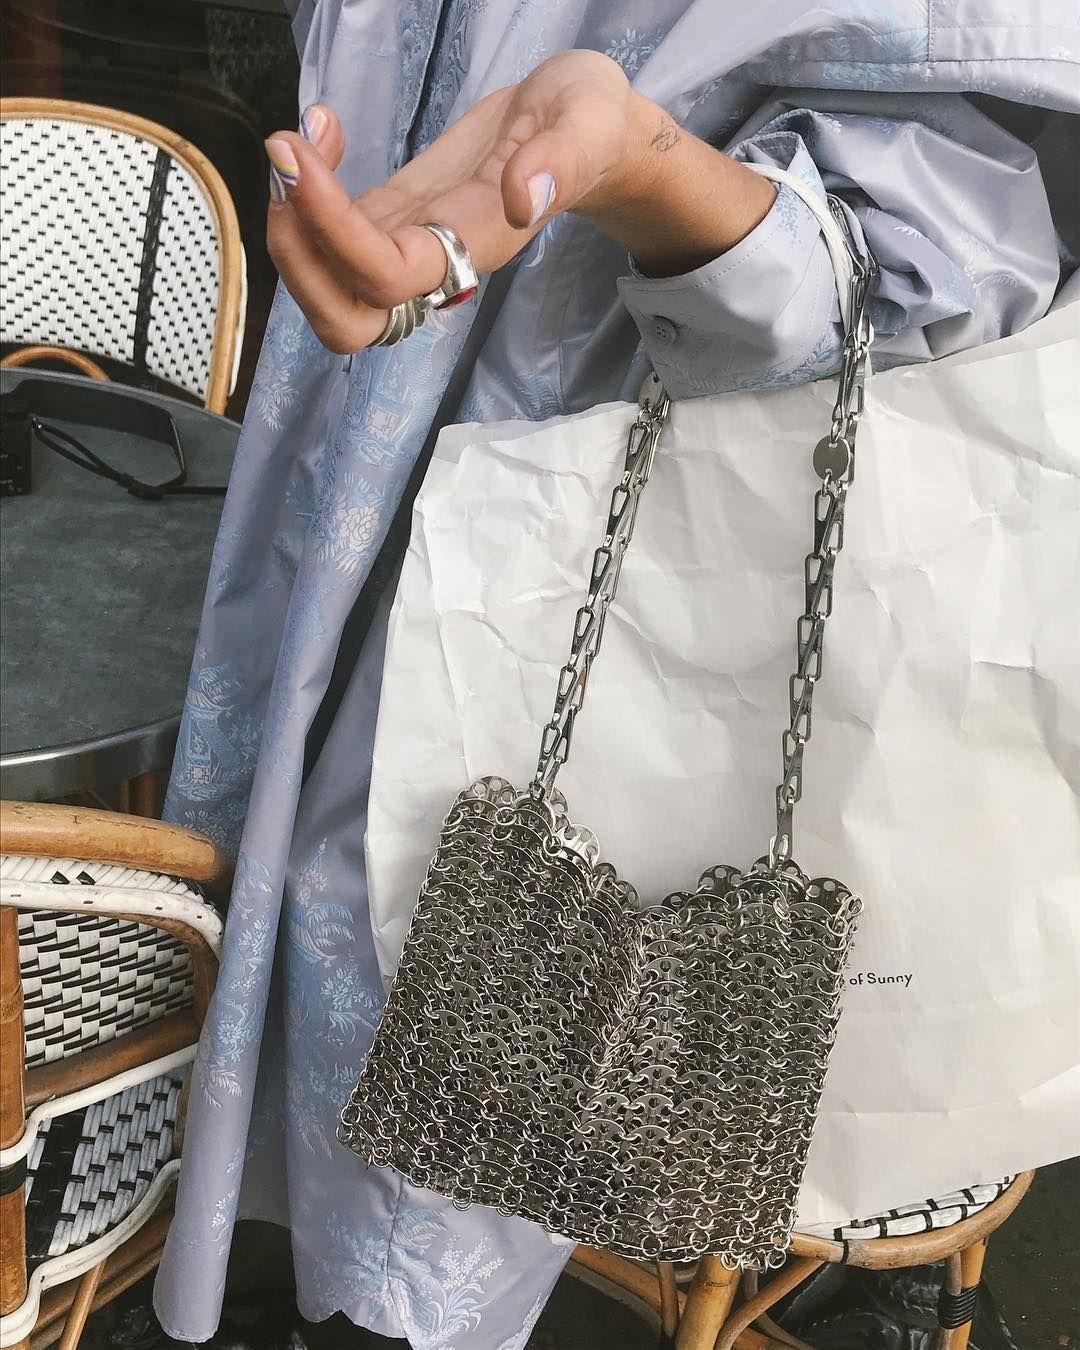 0528370442 Paco Rabanne Paco Rabanne, Parisian Chic, Fashion Bags, Fashion  Accessories, Fashion Killa